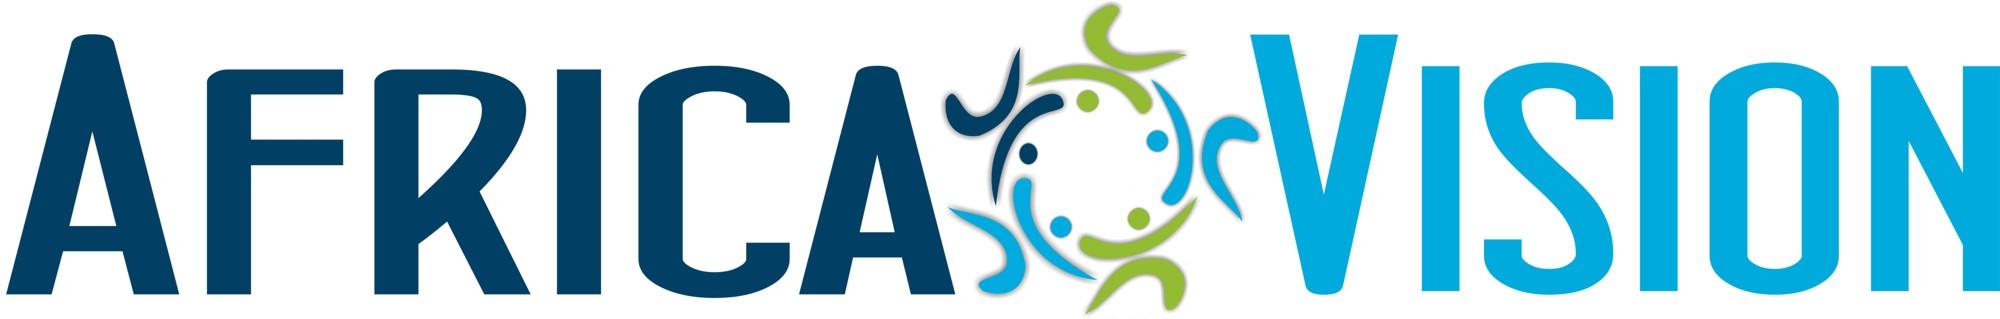 logo-africavision-horizontal-p